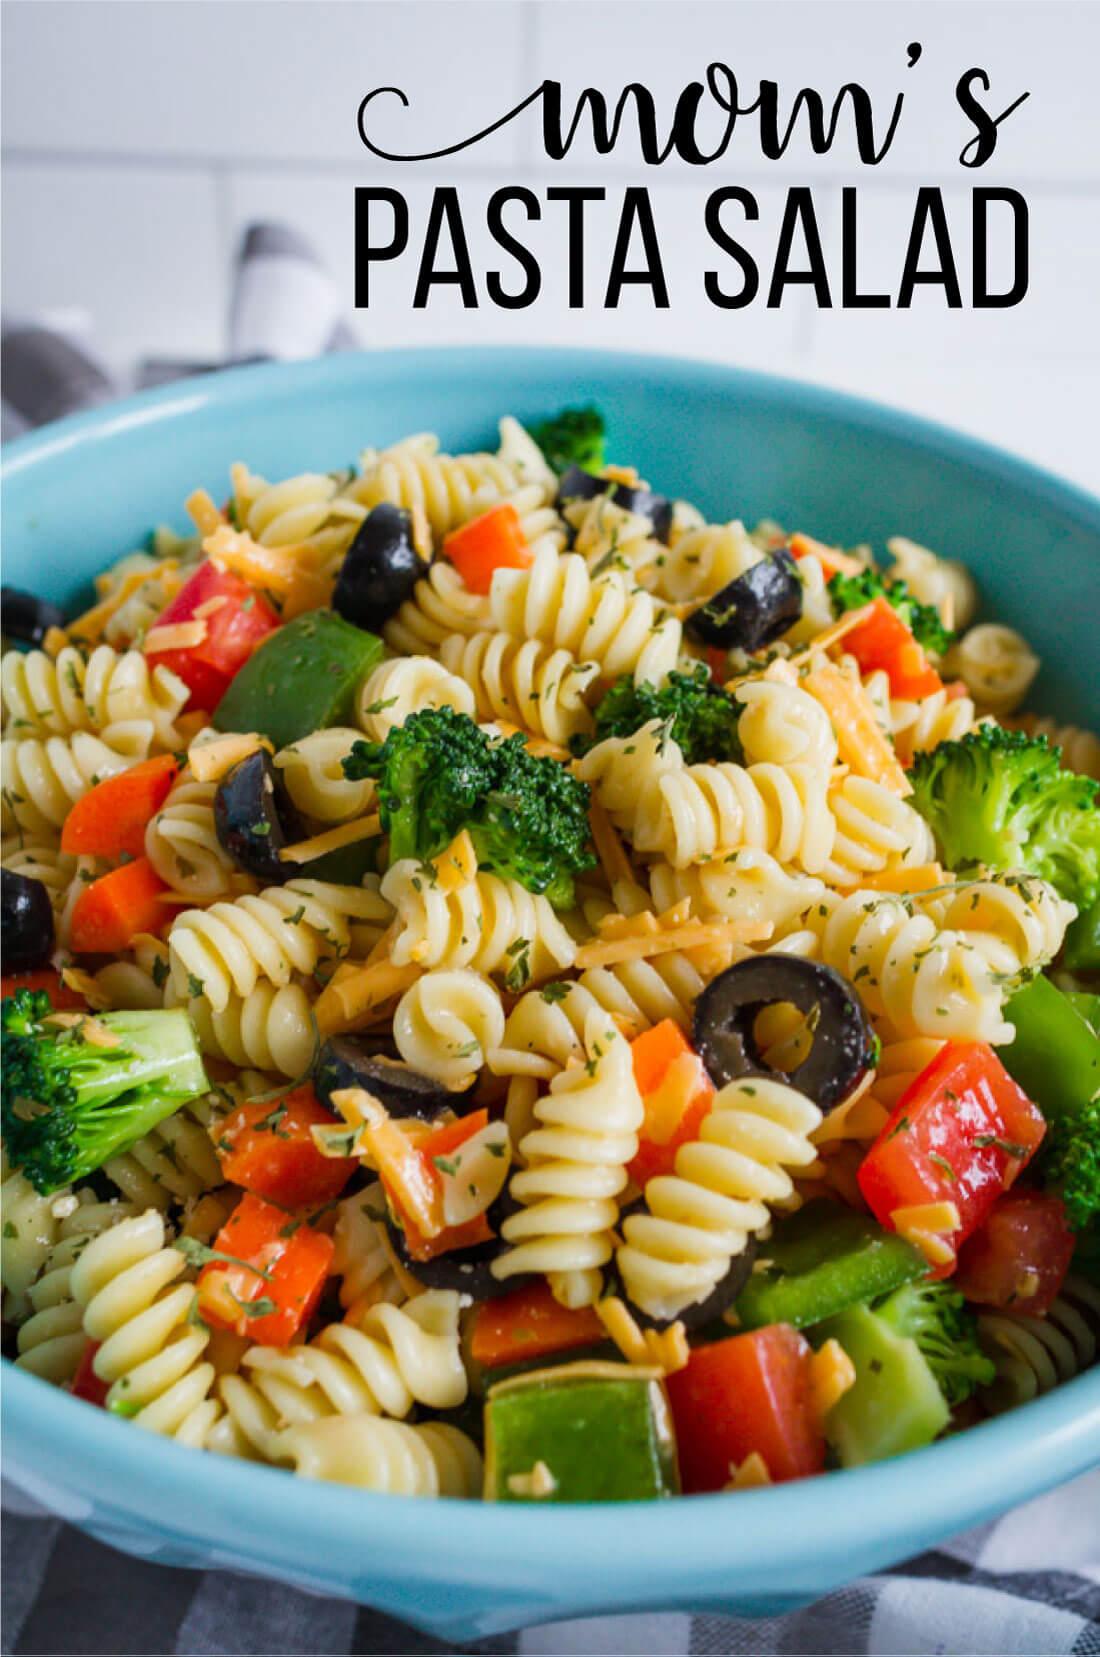 Mom's Pasta Salad Recipe - one of my all time favorites. www.thirtyhandmadedays.com